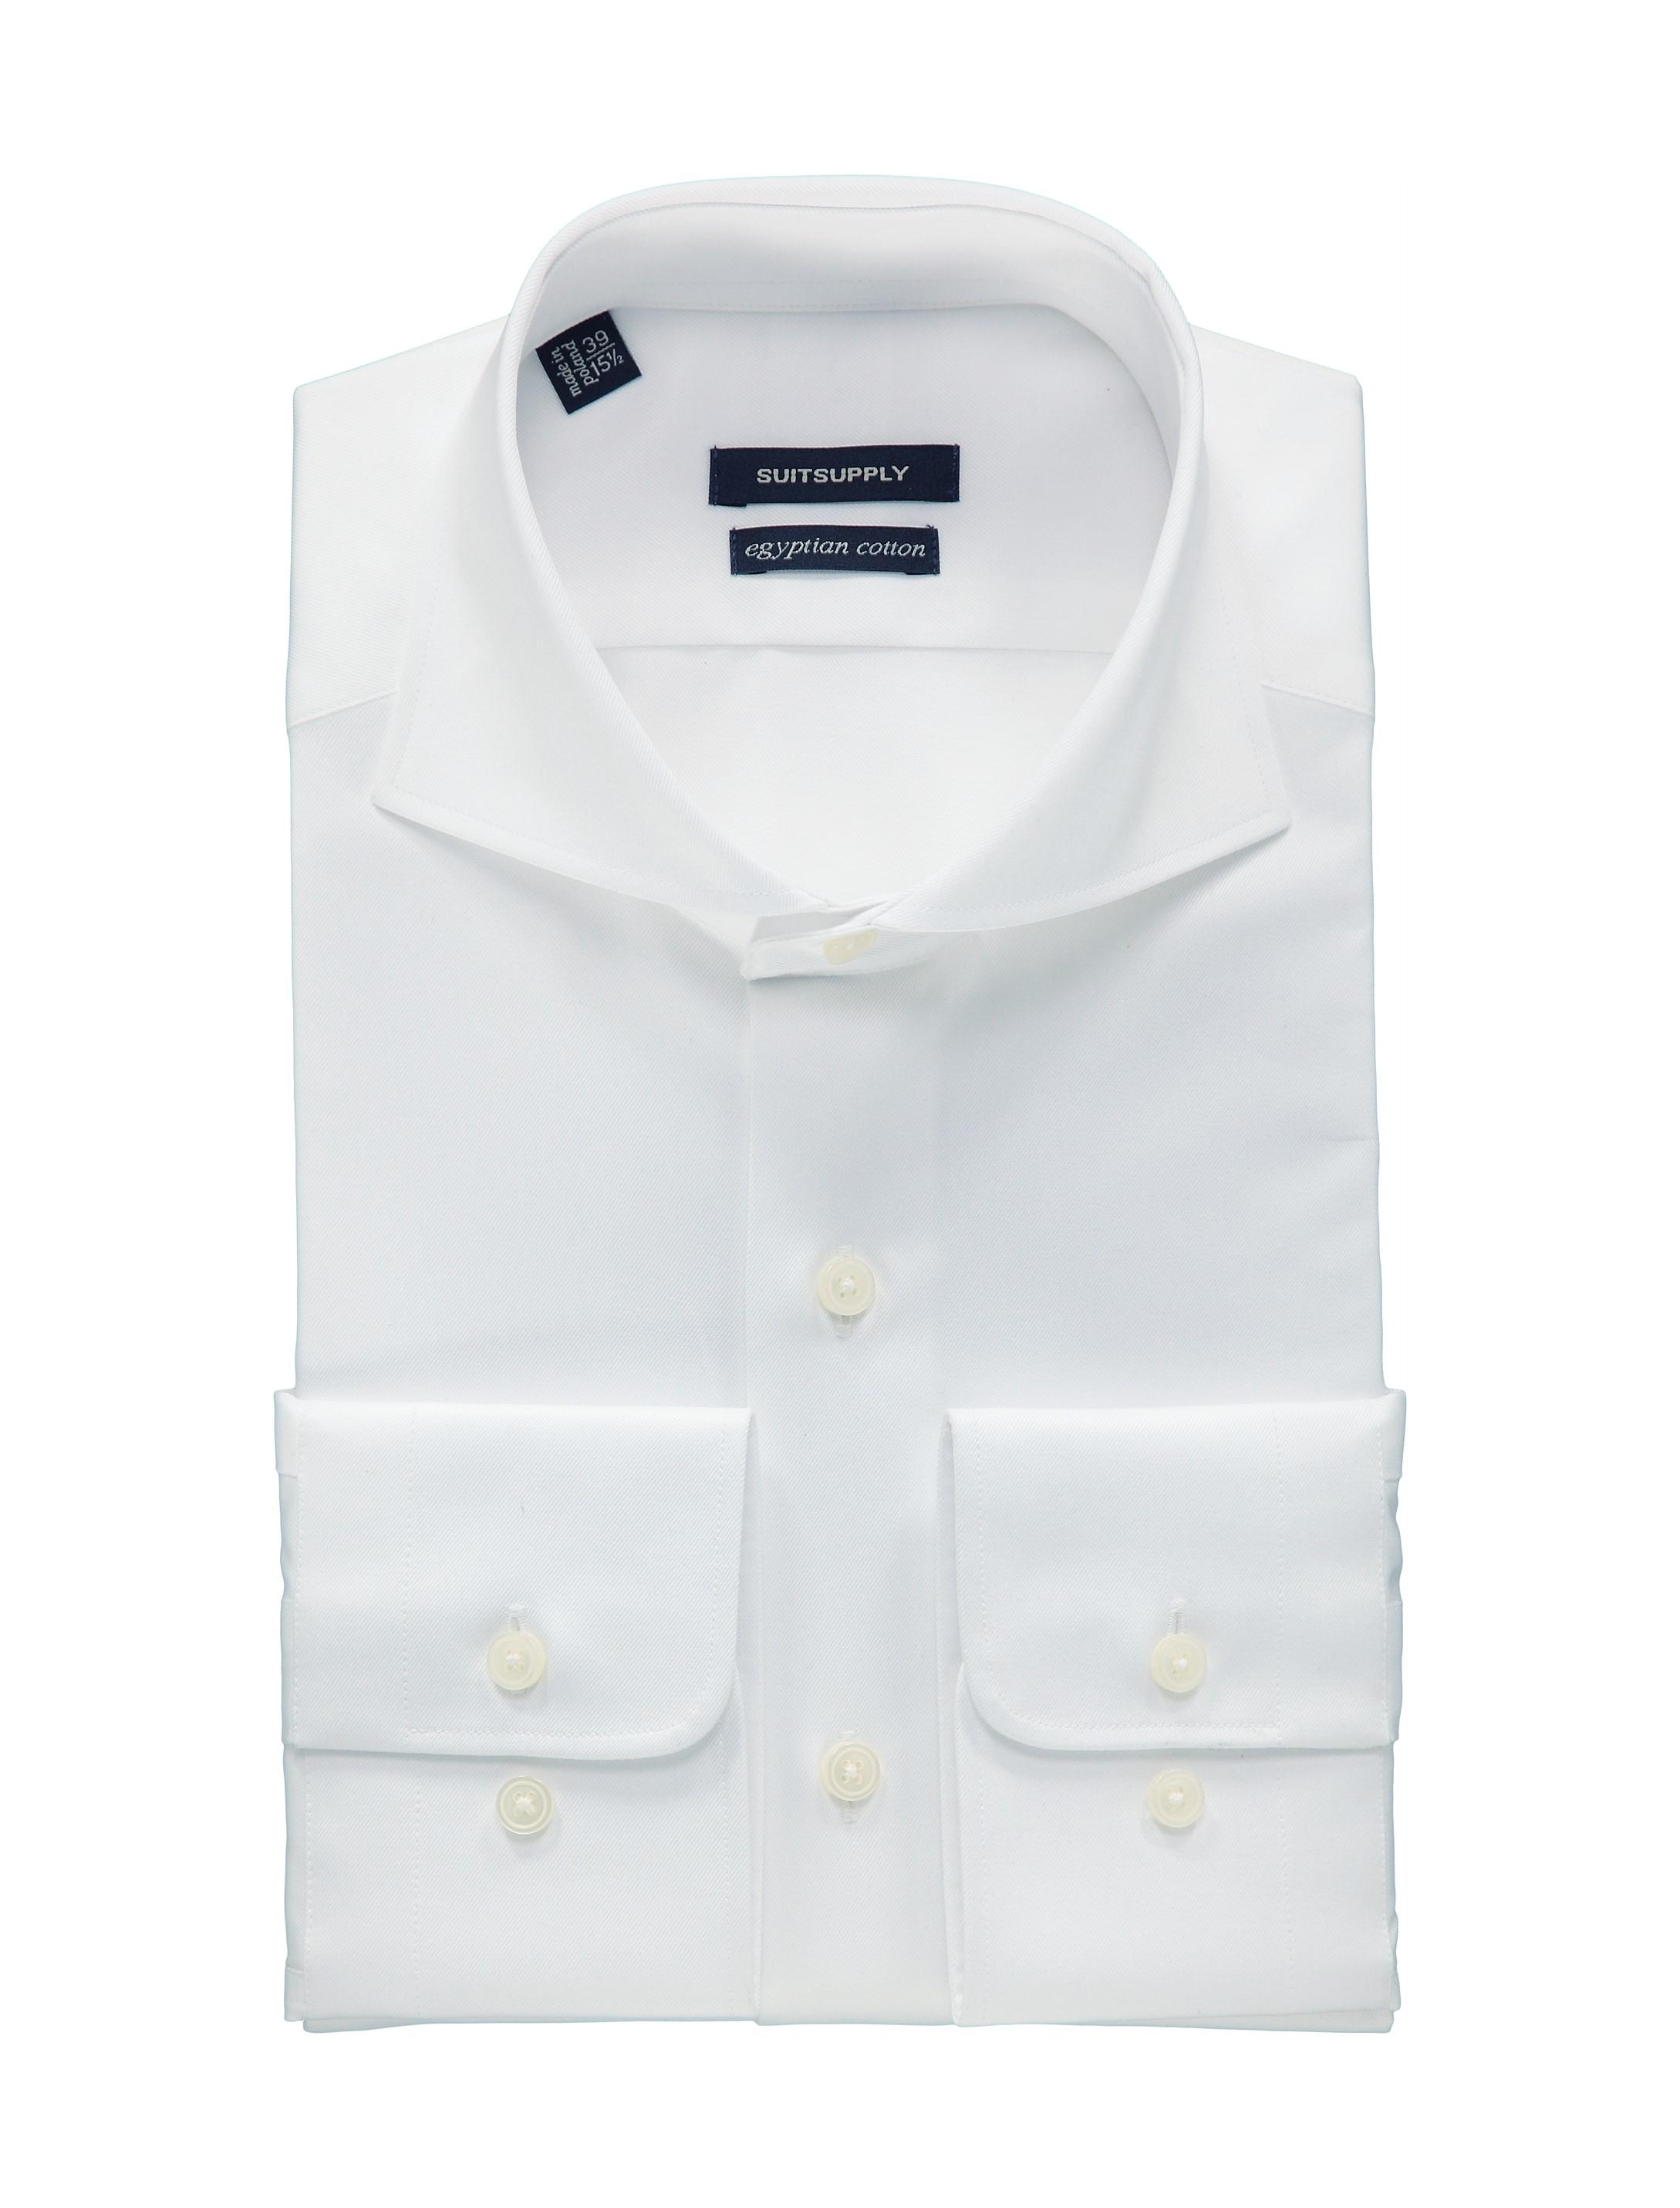 White shirt single cuff h4490u suitsupply online store for Single cuff dress shirt